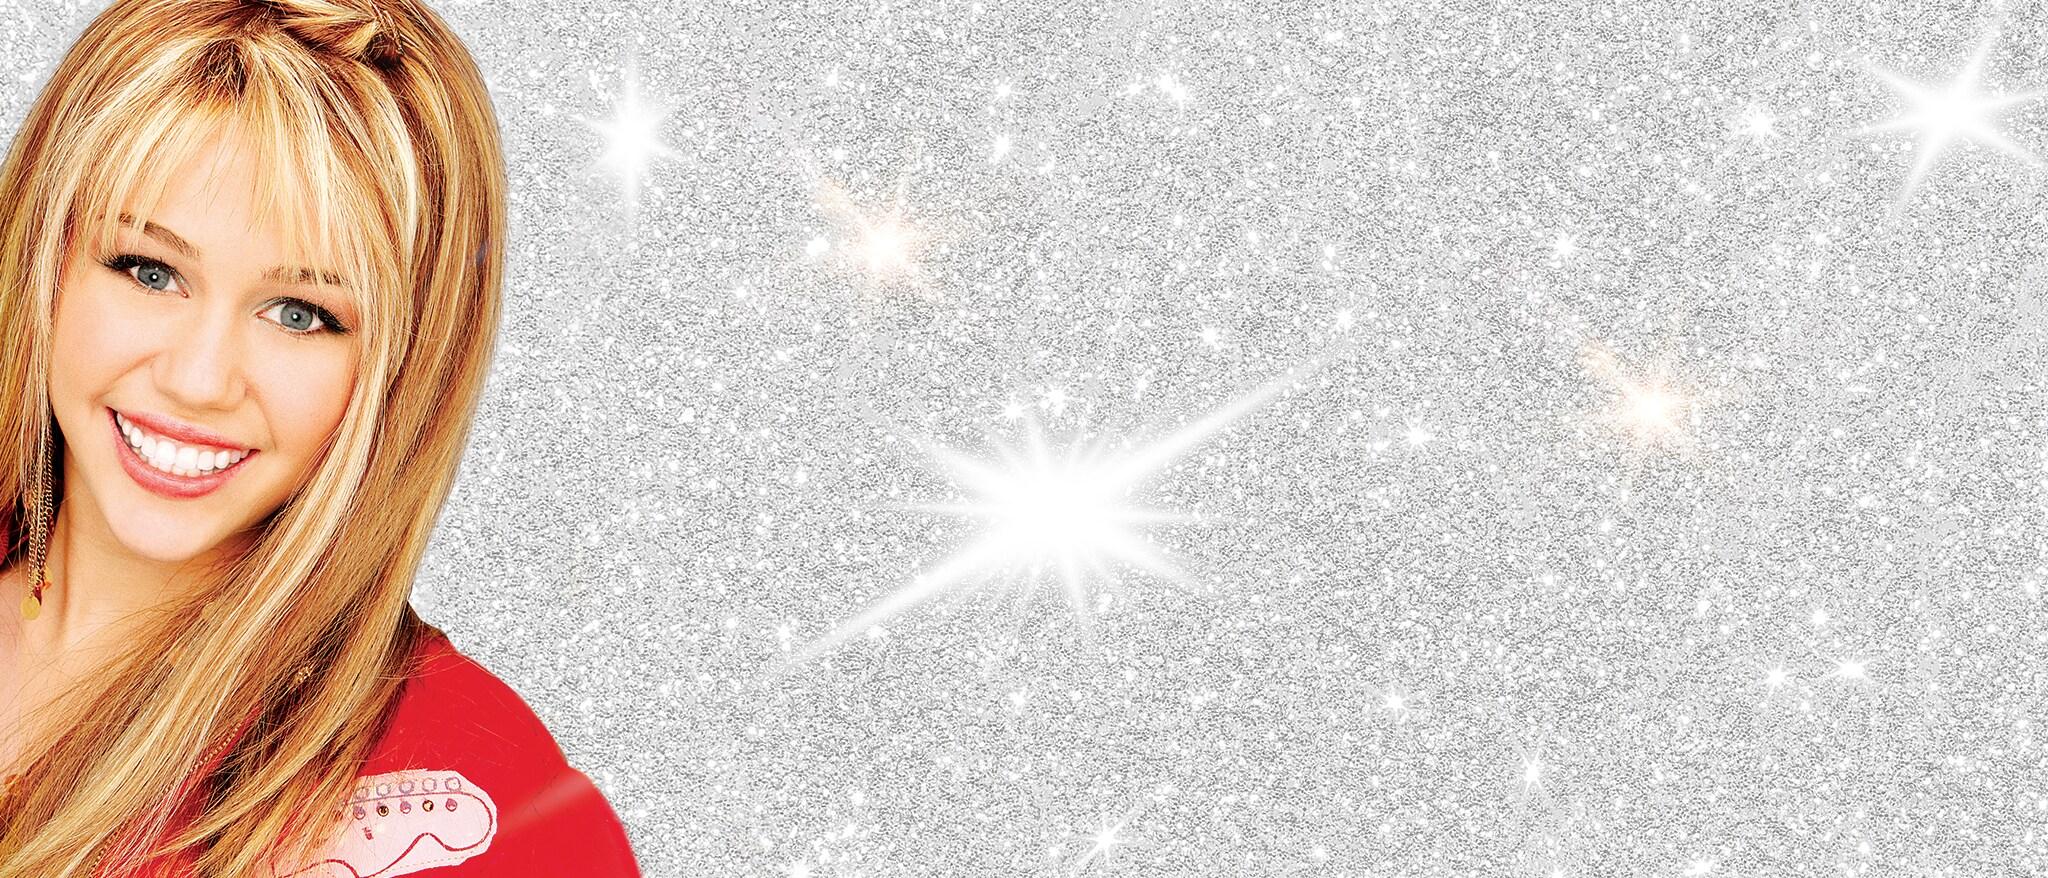 Hannah Montana: Pop Star Profile Hero